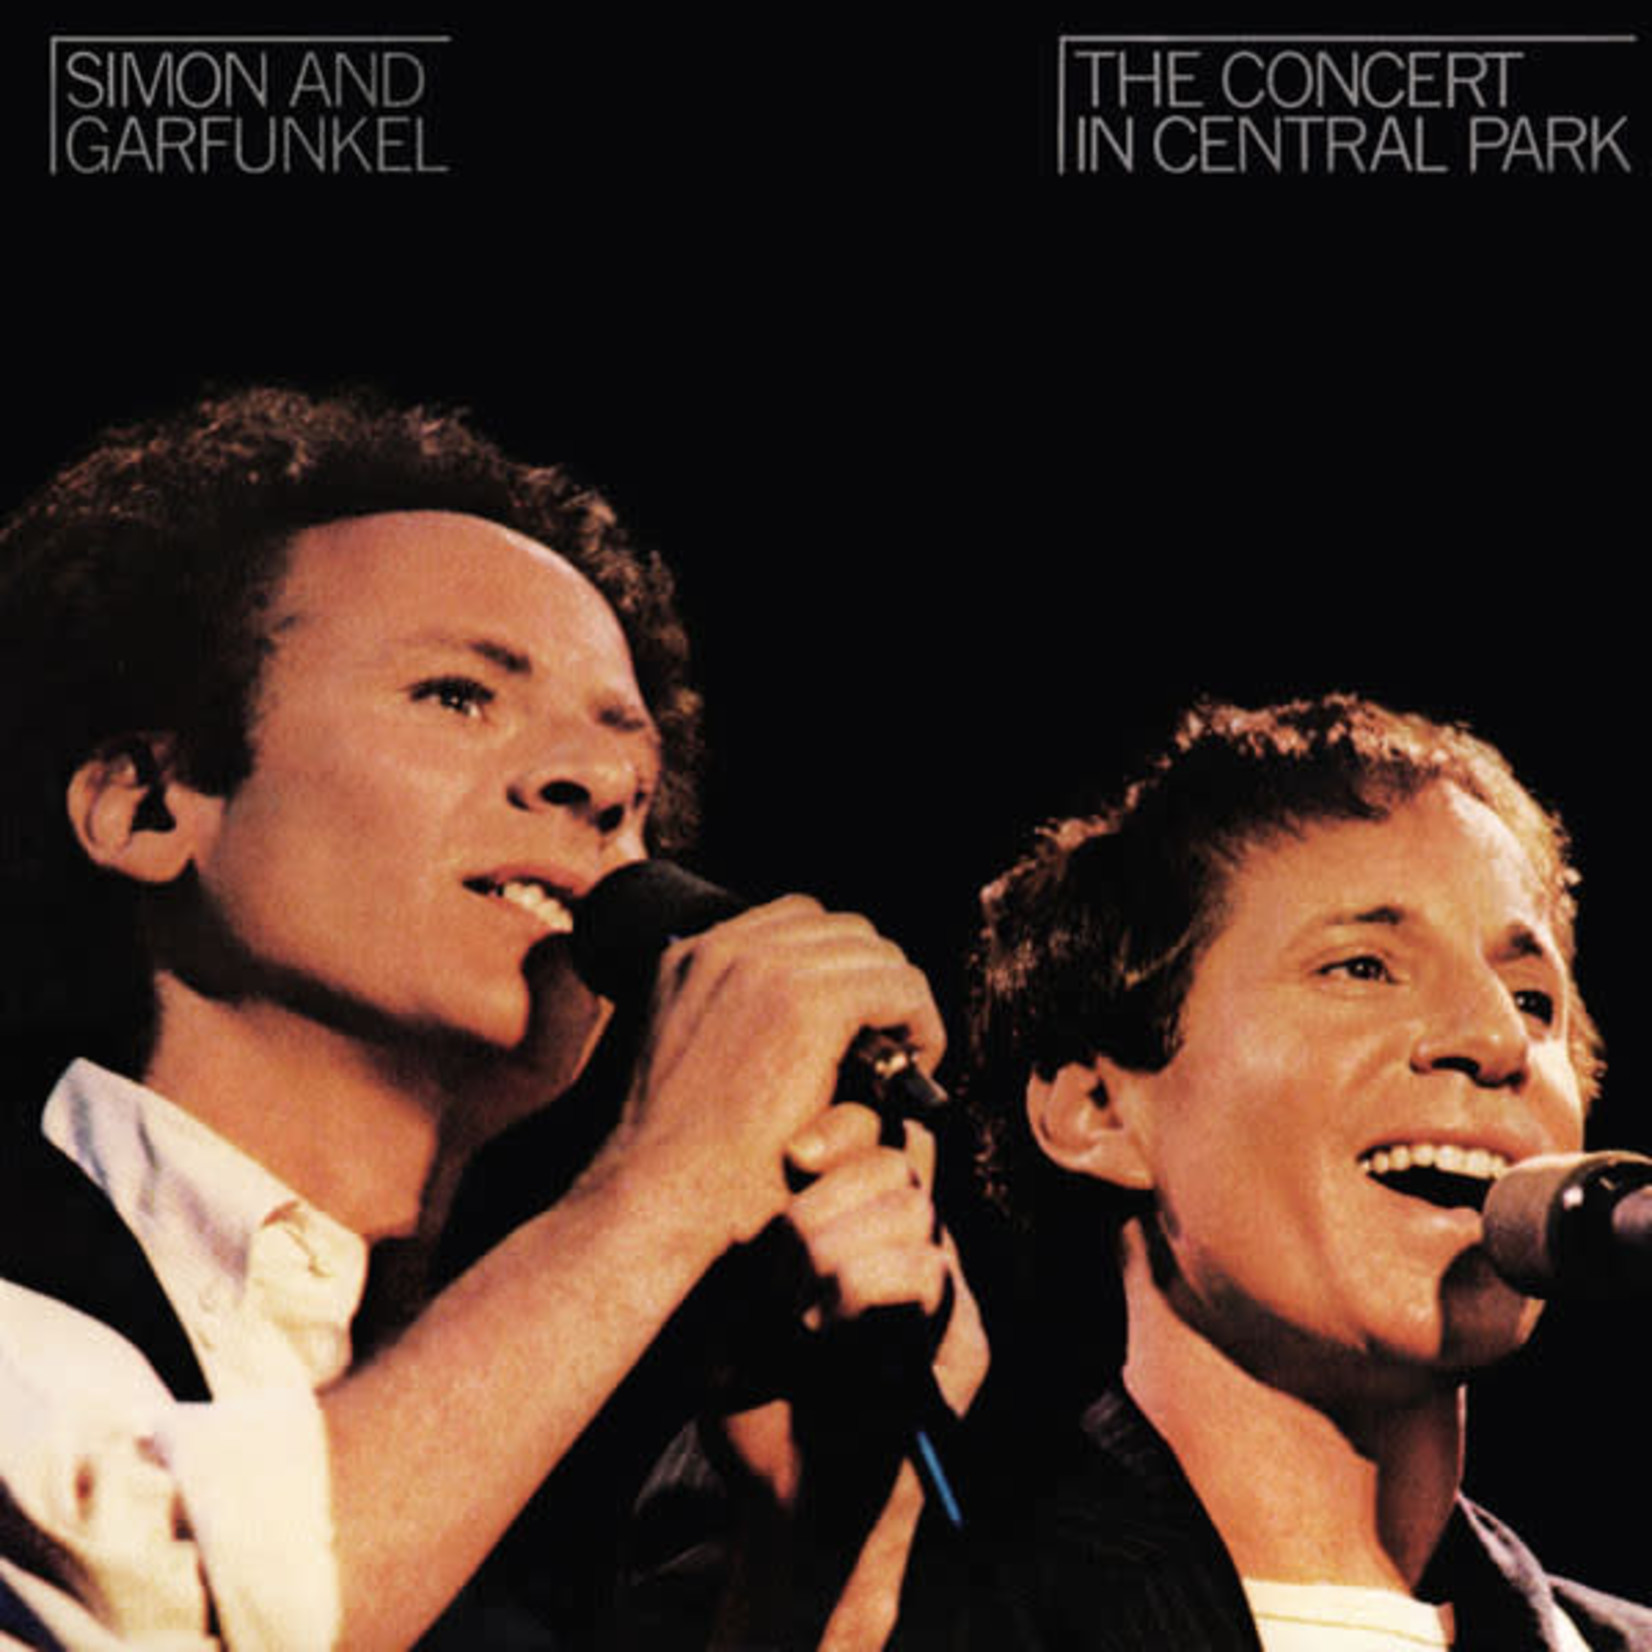 [Vintage] Simon & Garfunkel: Concert in Central Park